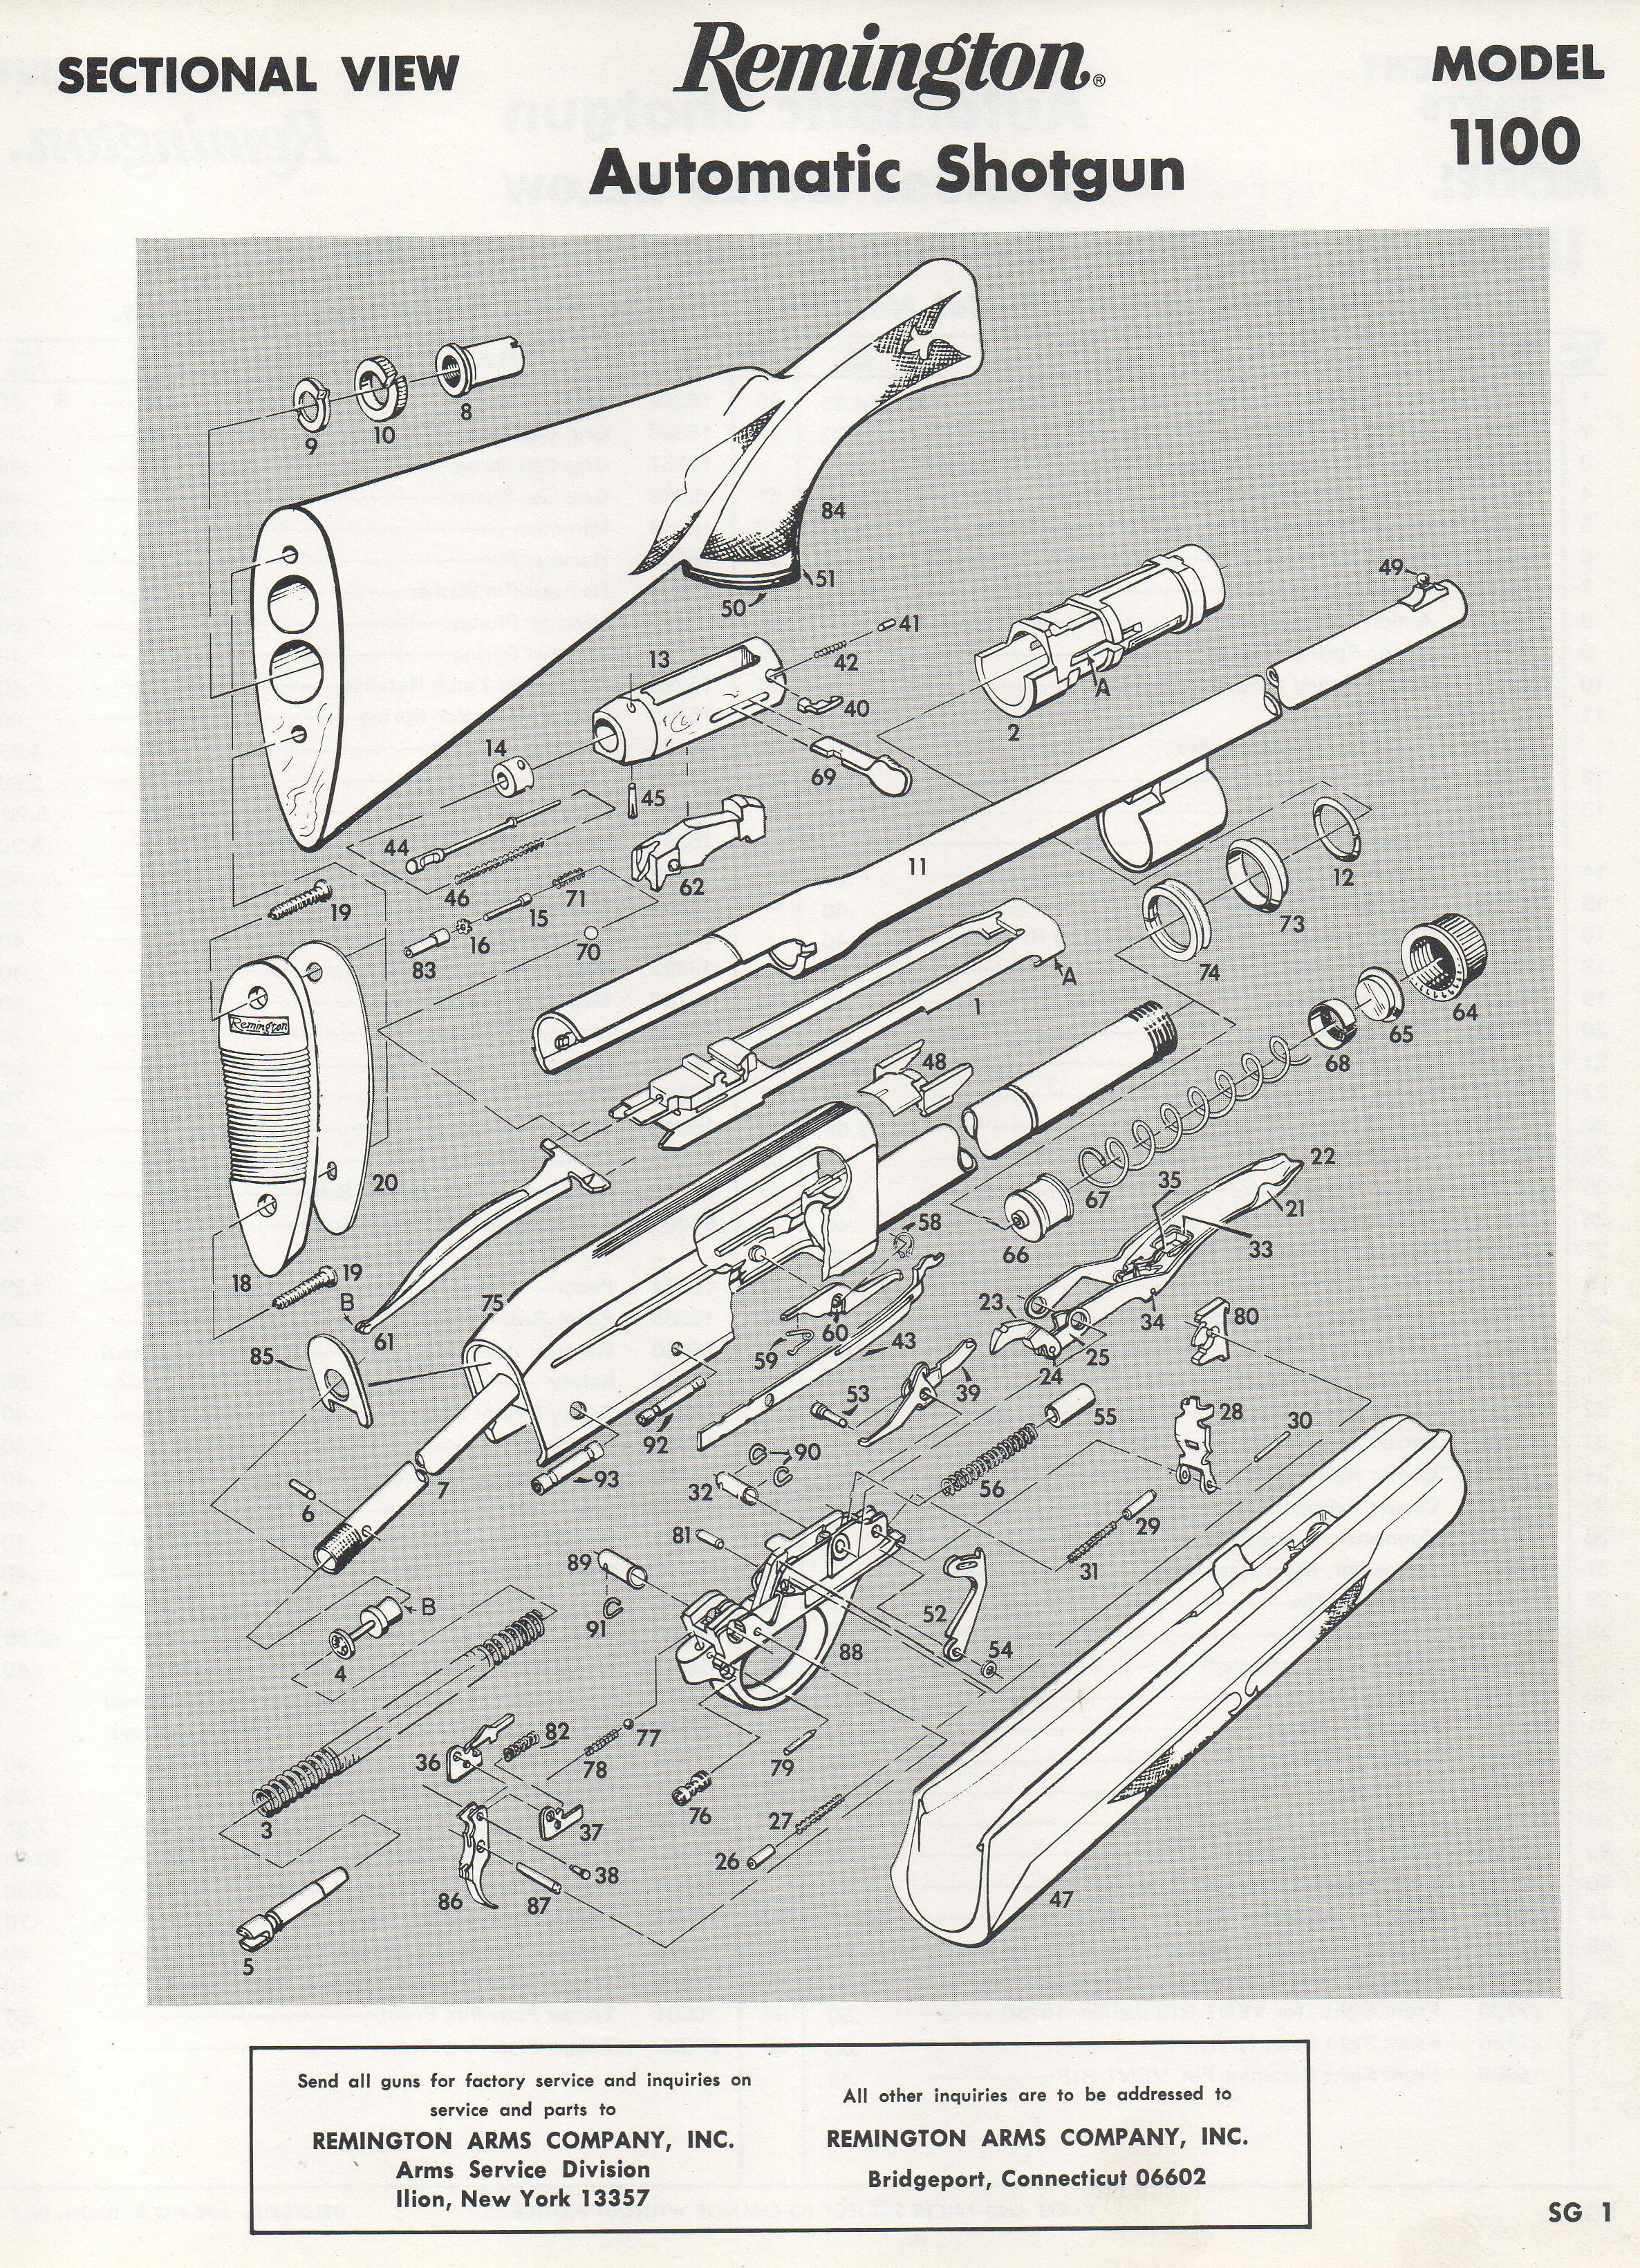 Remington 58 / 1100 / 11-87 Semi